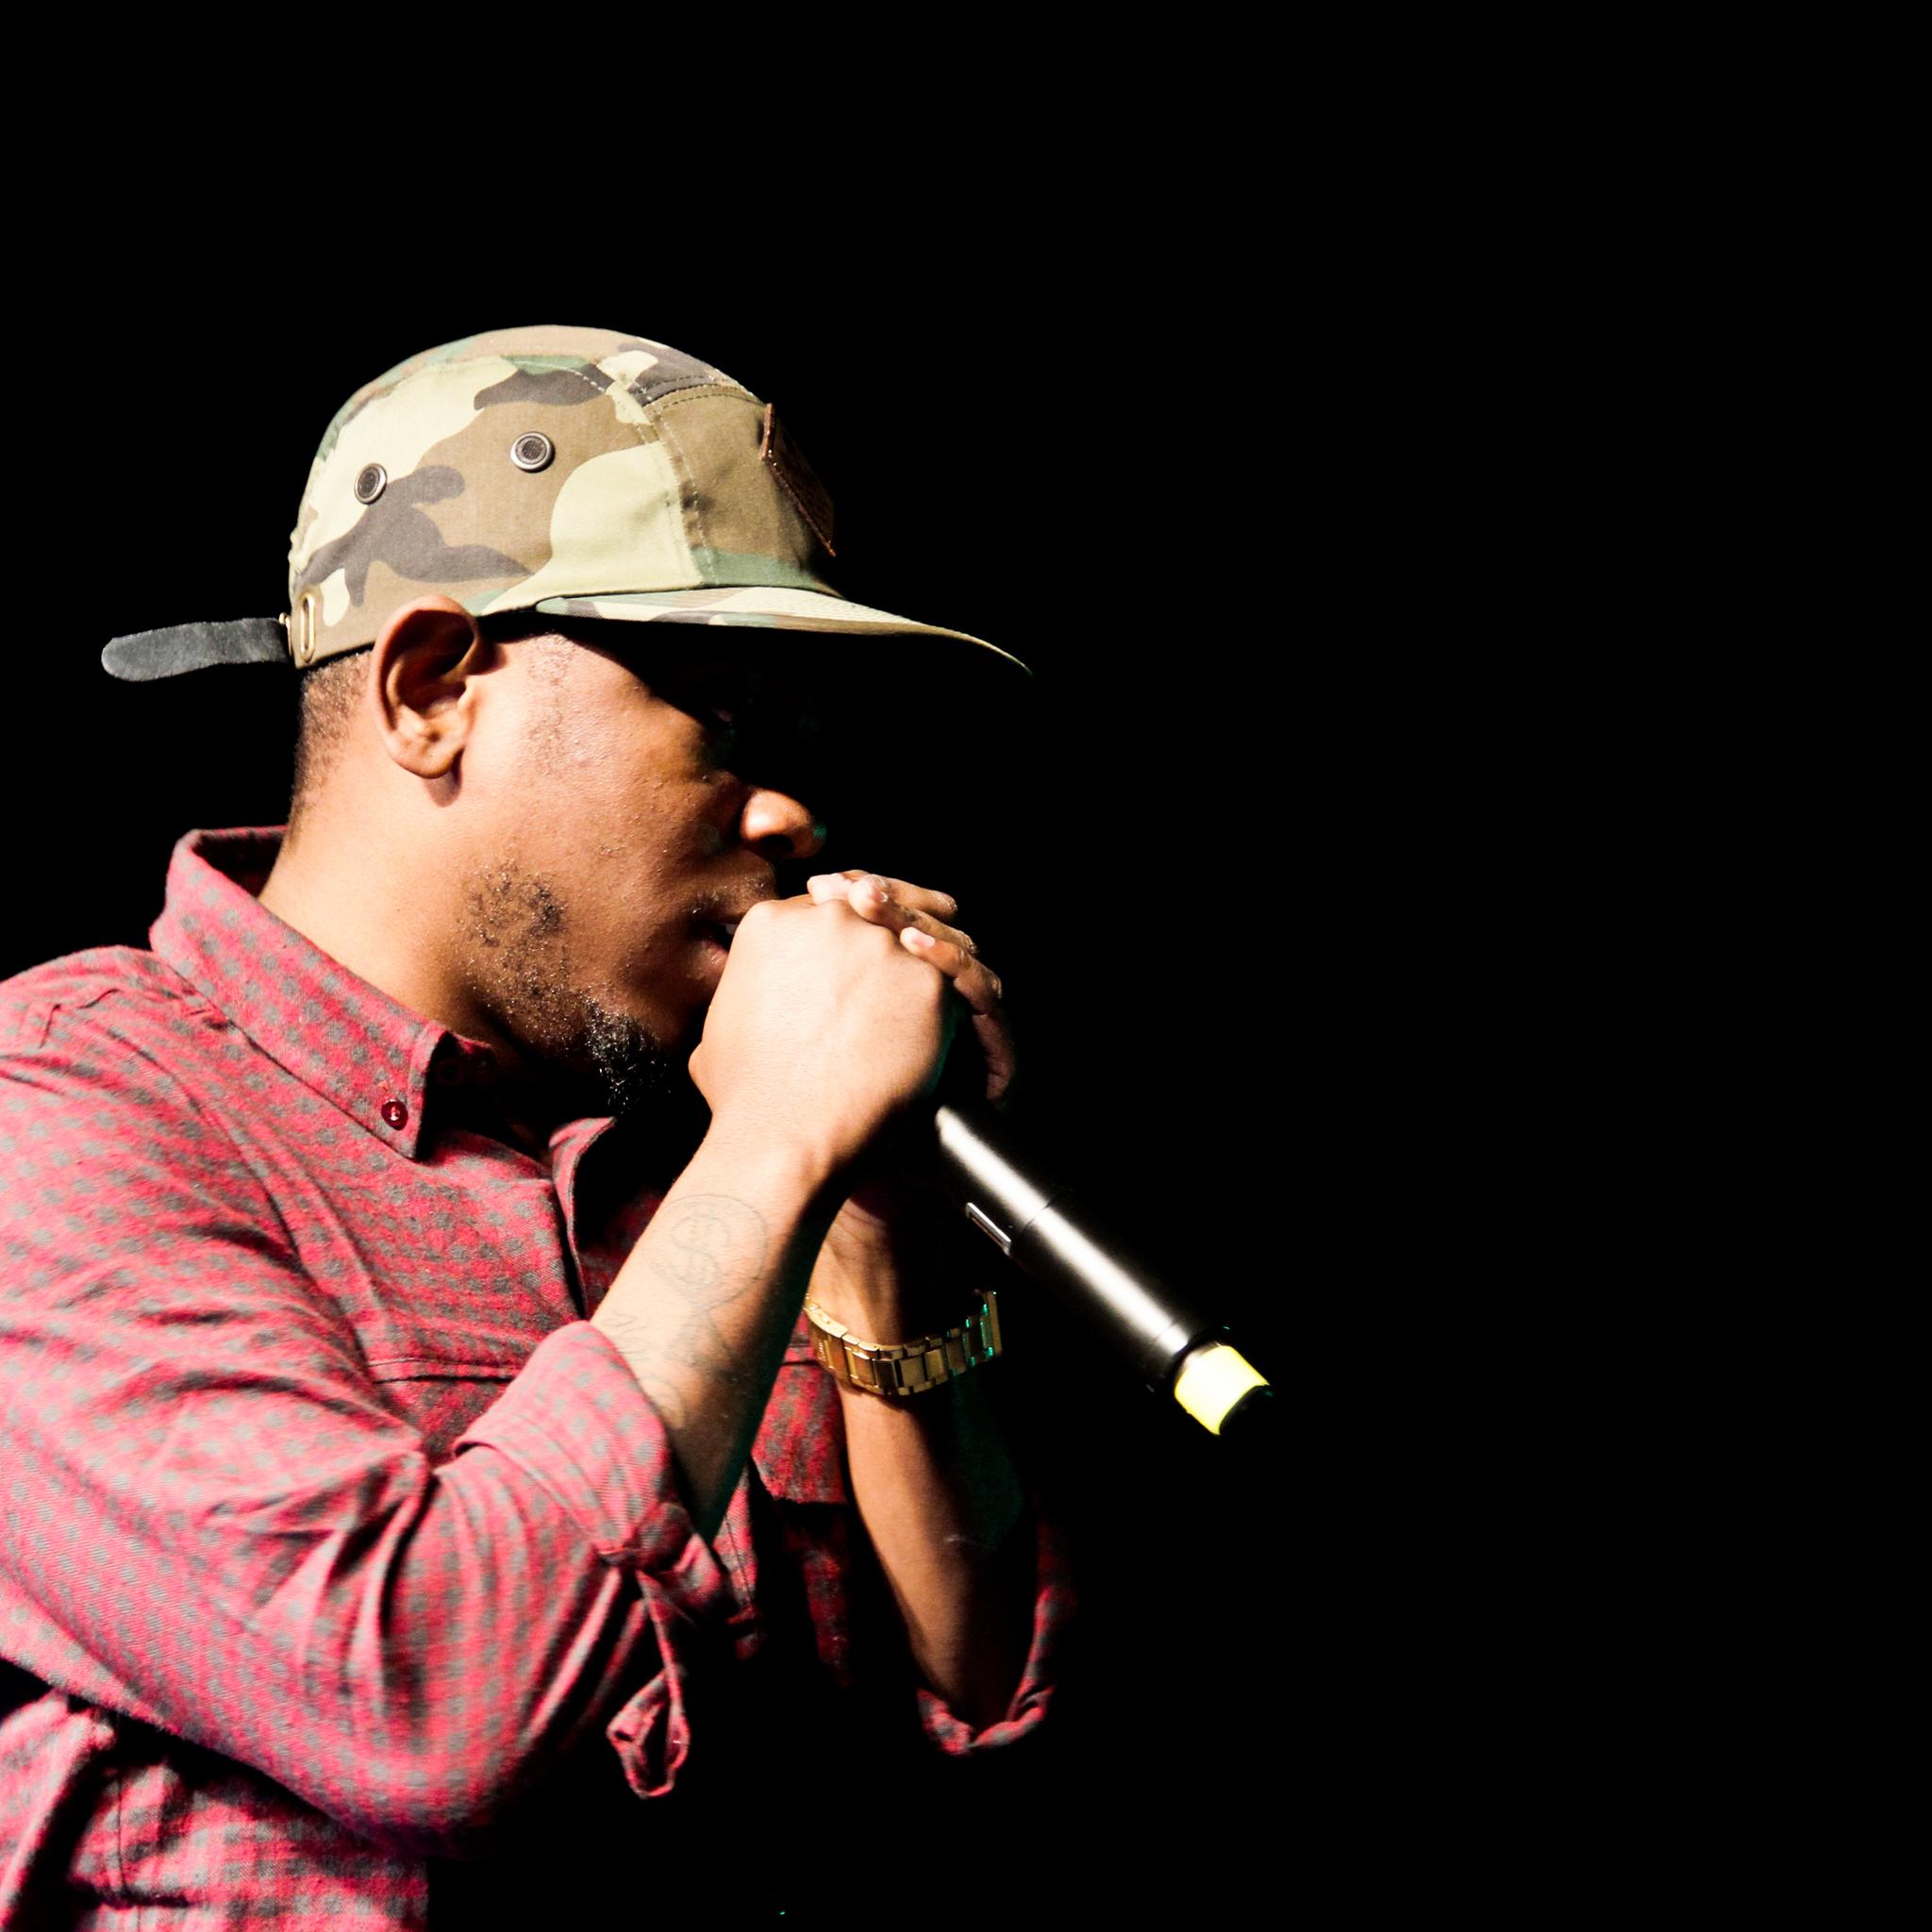 Kendrick-Lamar-3Wallpapers-iPad-Retina